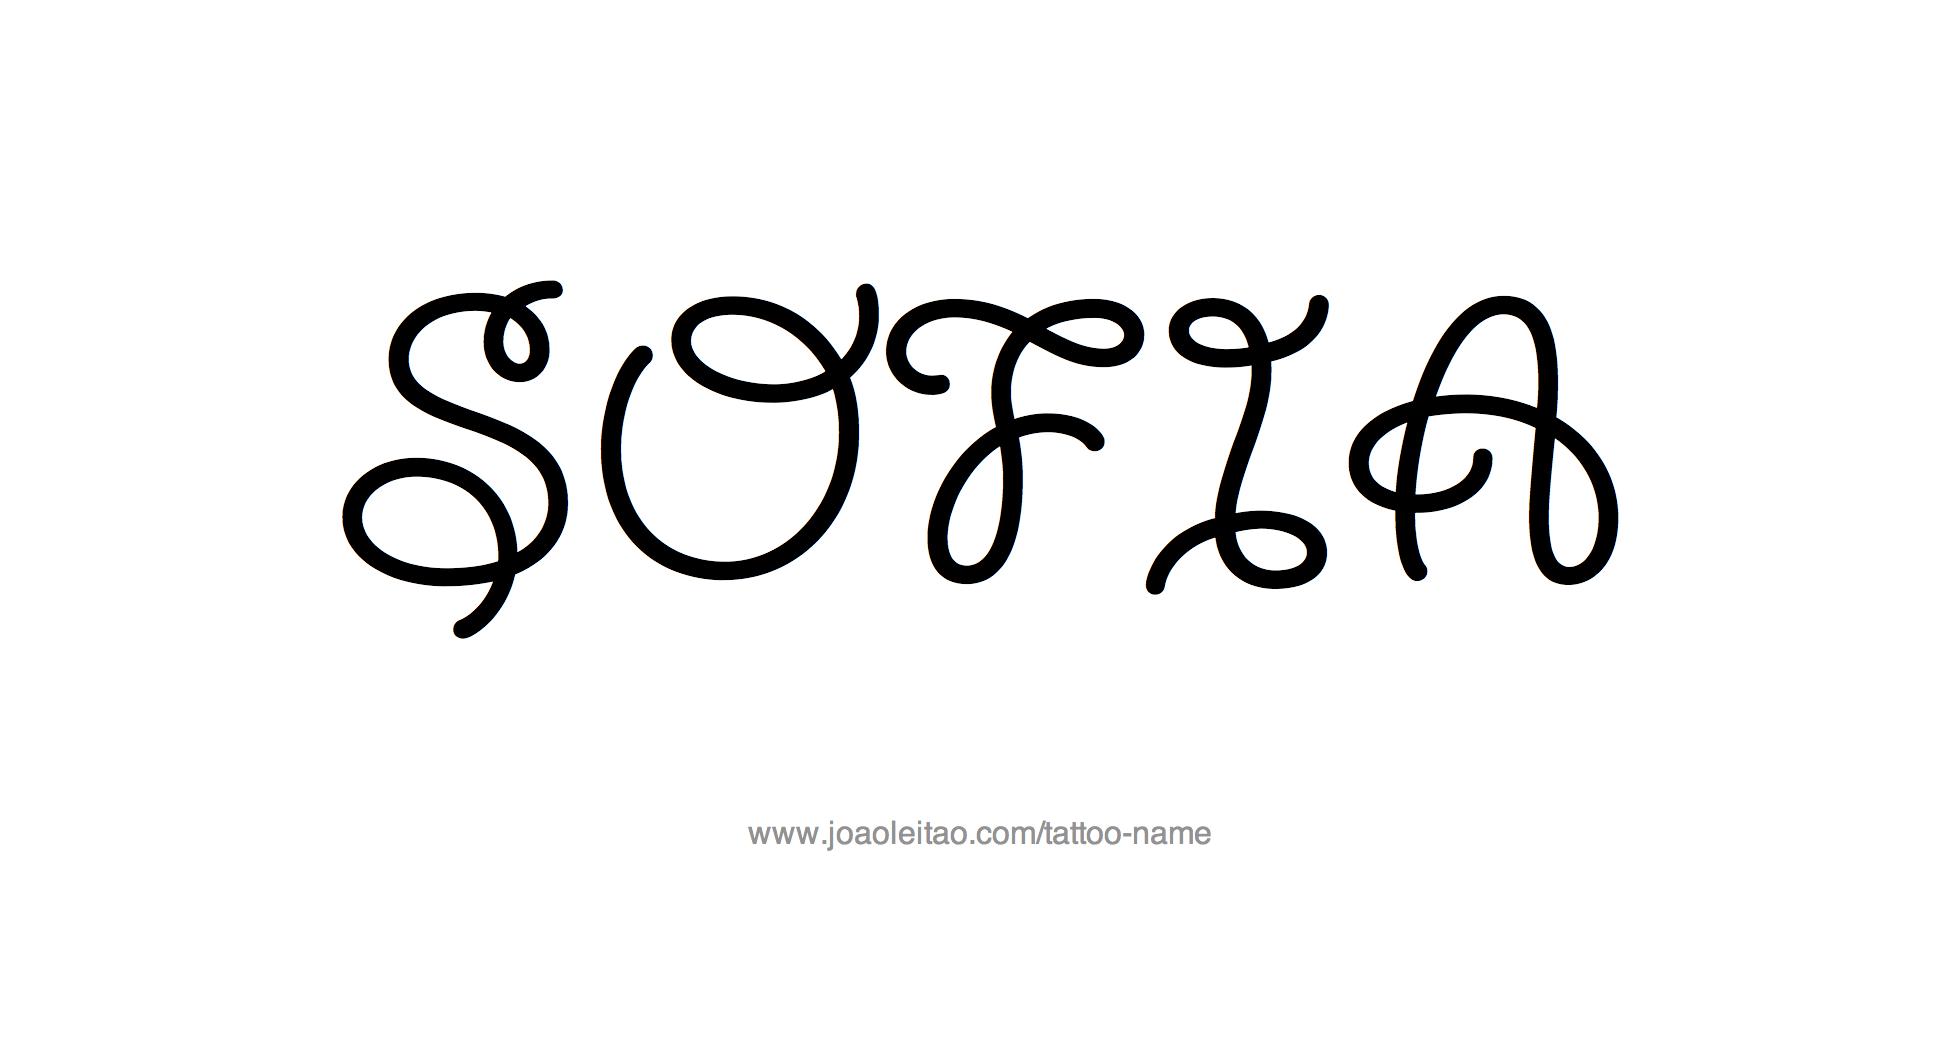 Sofia Name Tattoo Designs : tattoo design female name sofia2028629 from www.joaoleitao.com size 1960 x 1052 png 98kB